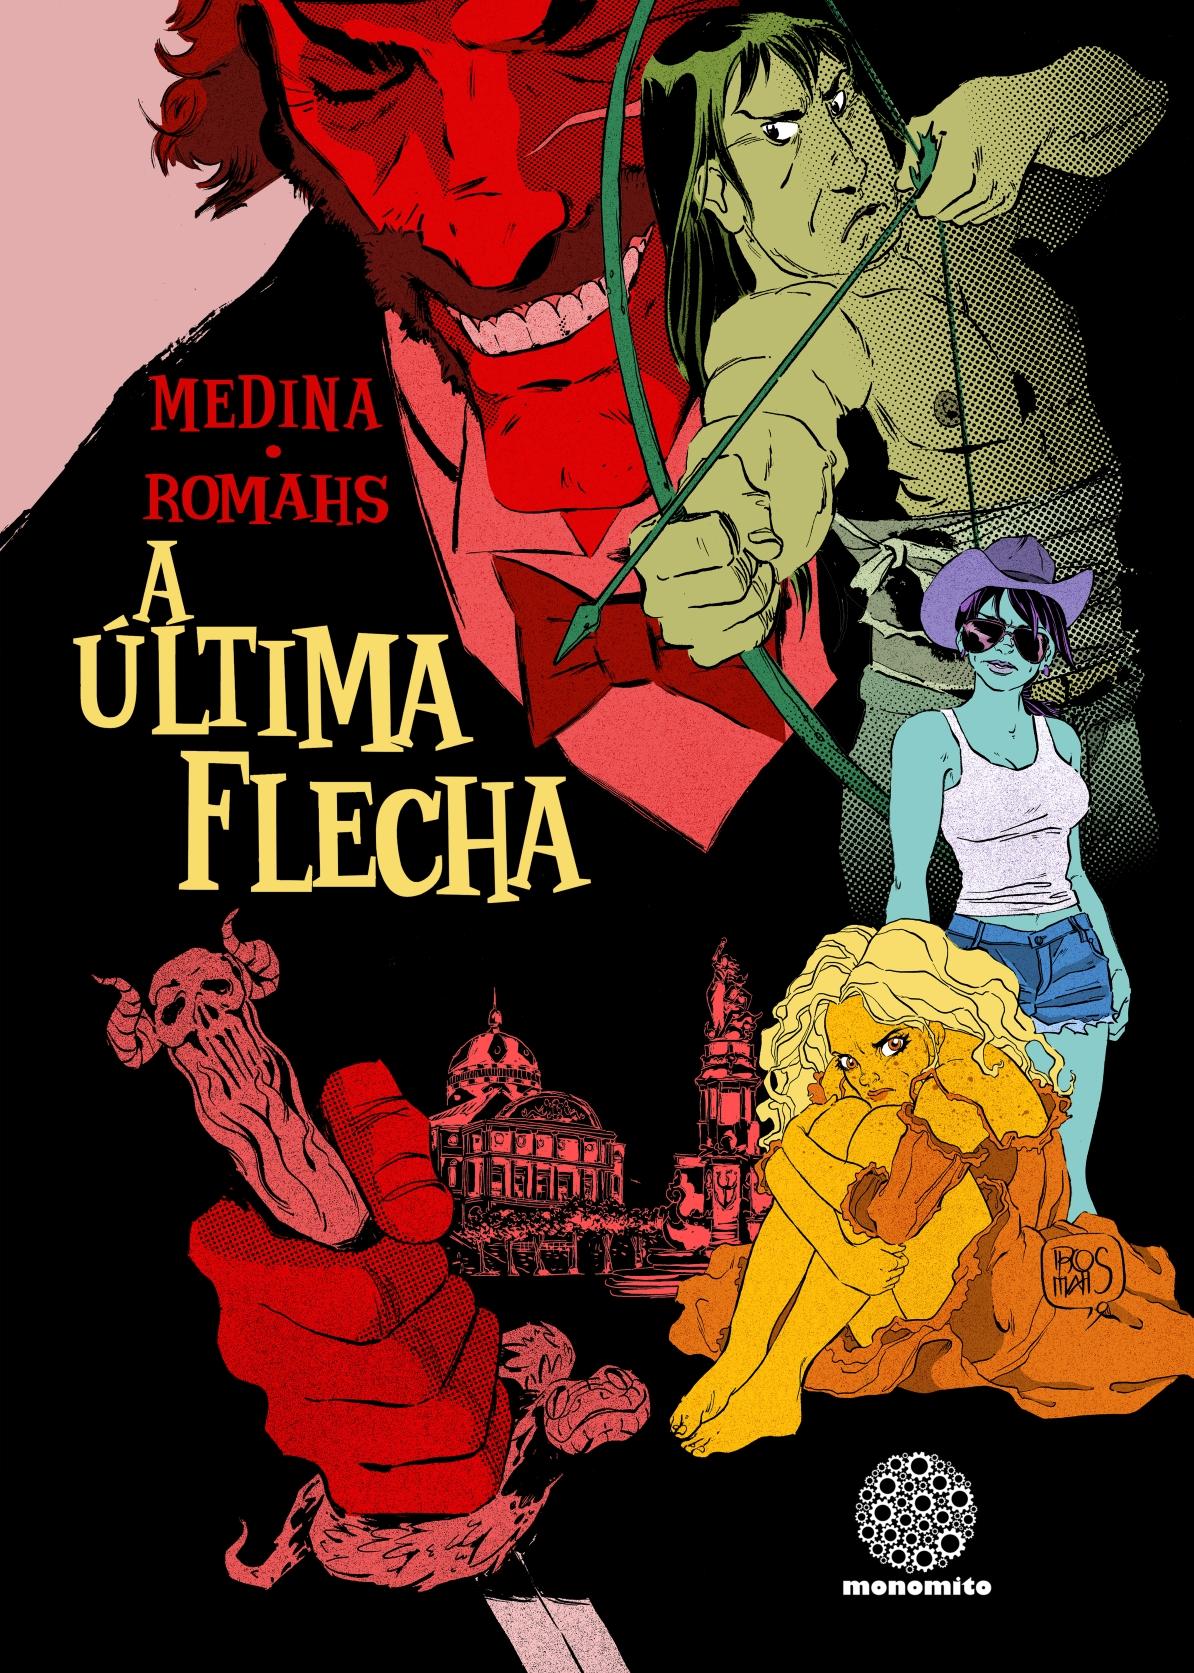 Graphic Novel 'A Última Flecha' explora tema de violência contra povos indígenas 1